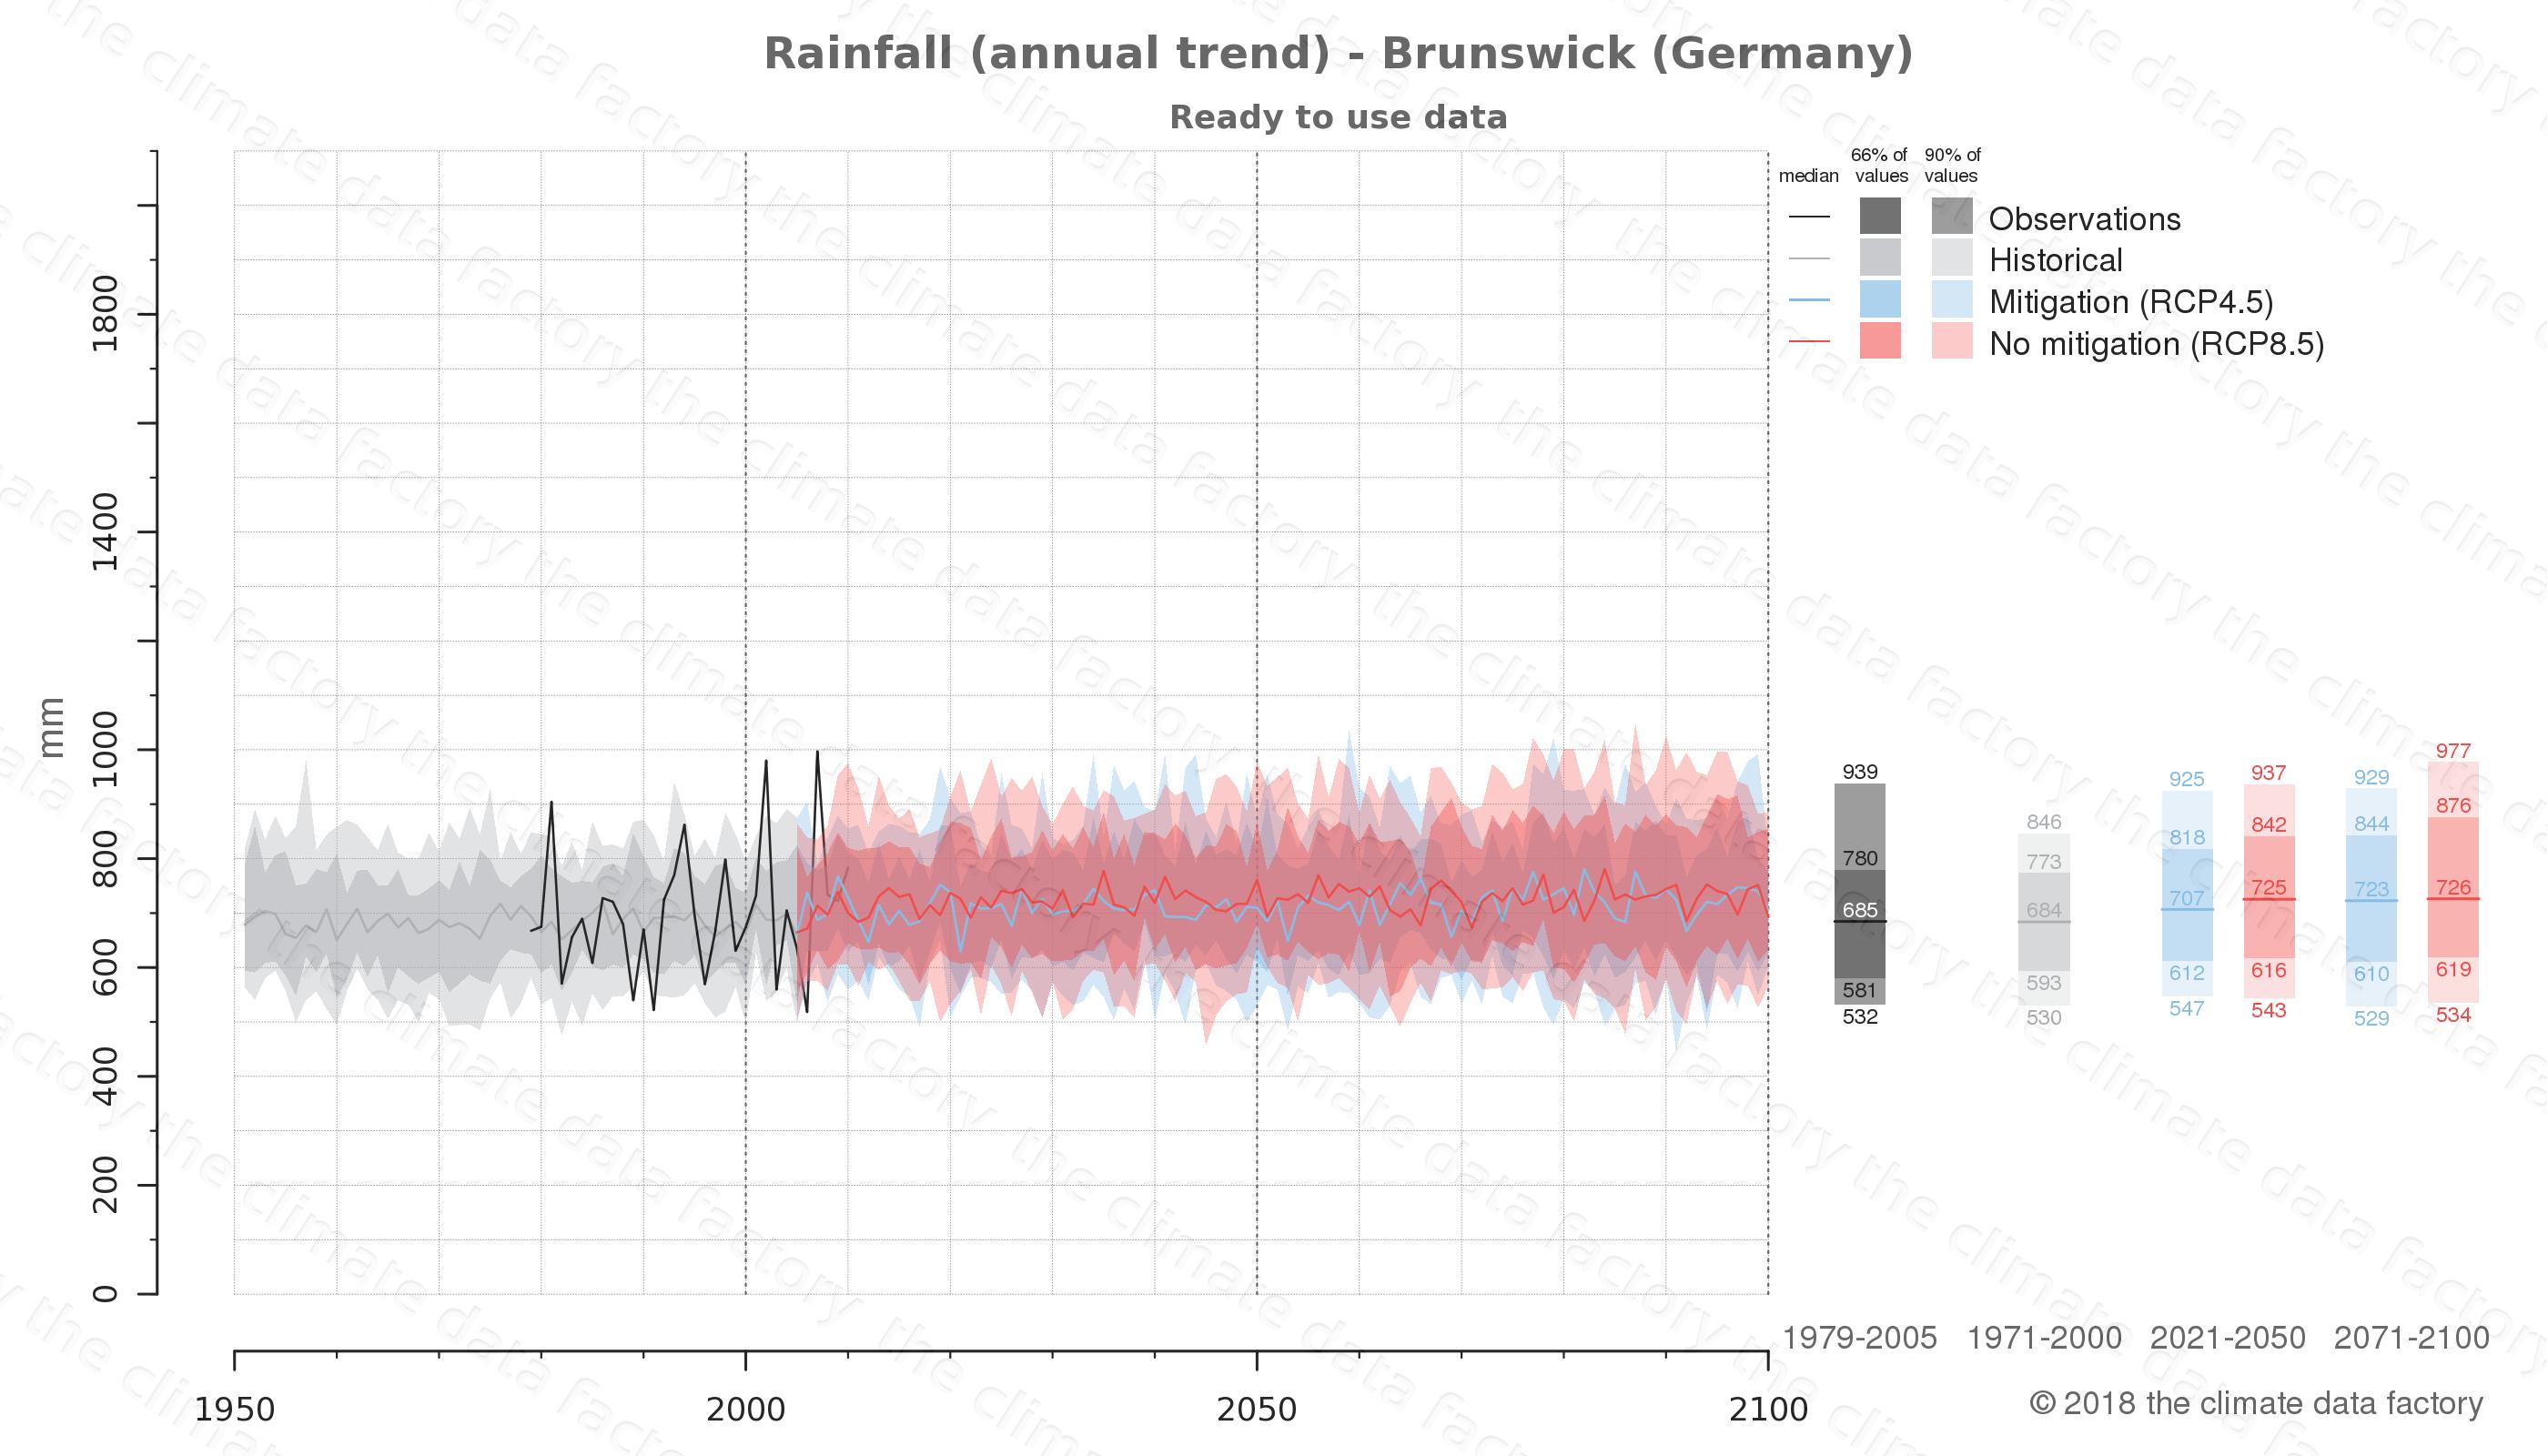 climate change data policy adaptation climate graph city data rainfall brunswick germany